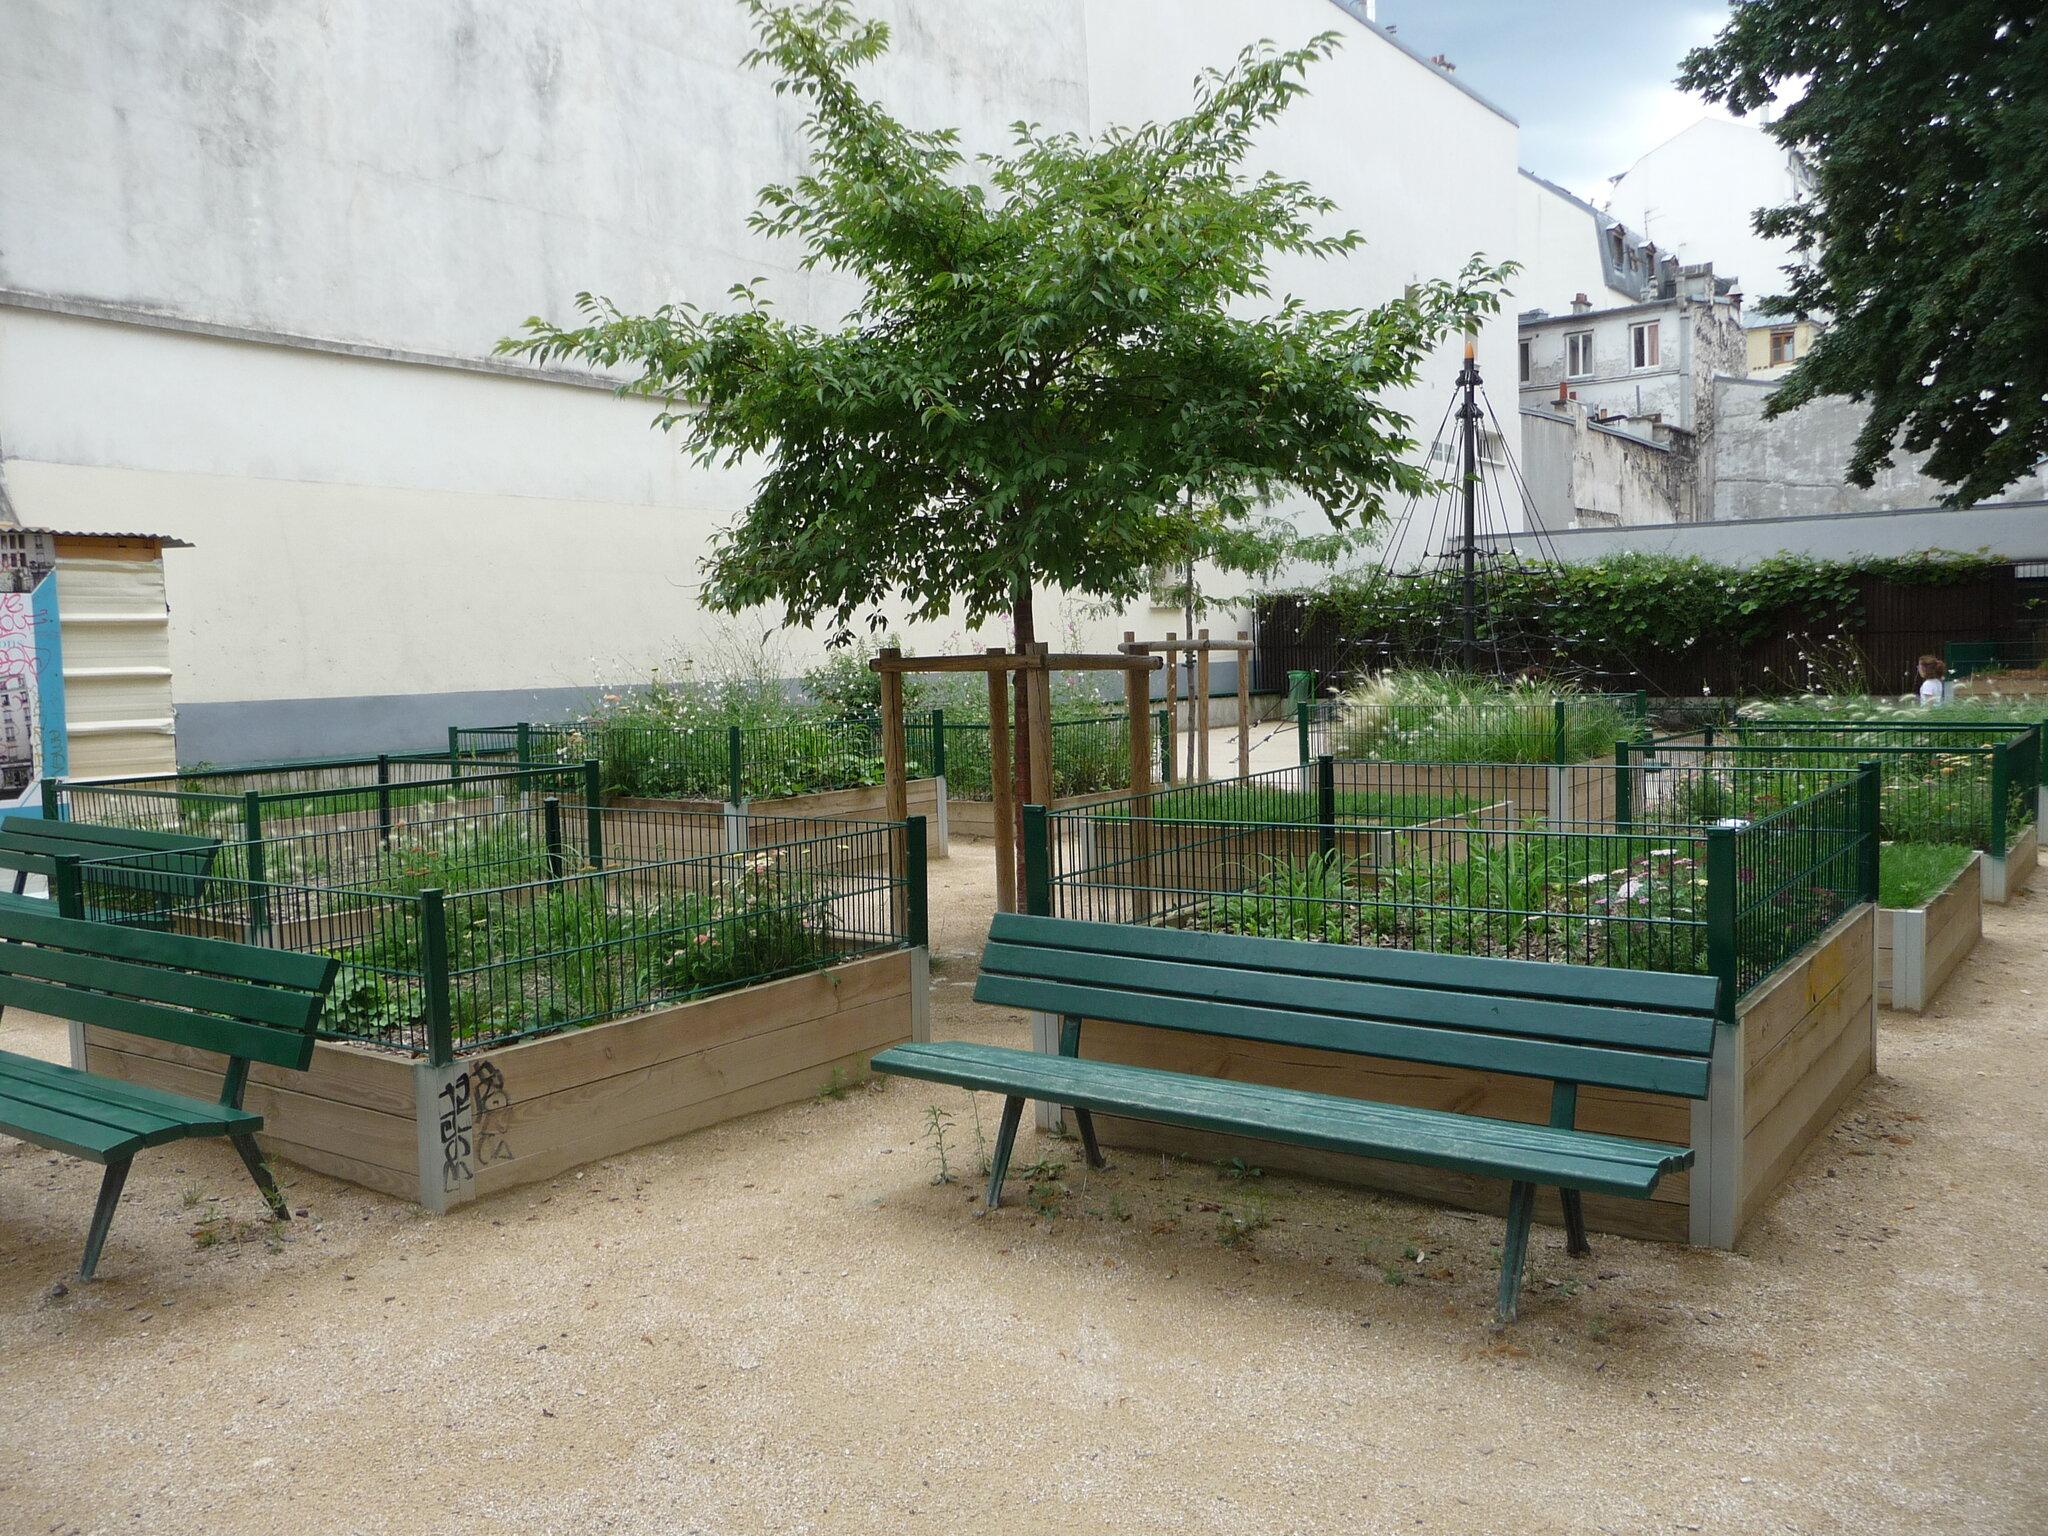 P1110565 photo de le square olga bancic le jardin d 39 olga for O jardins d eglantine